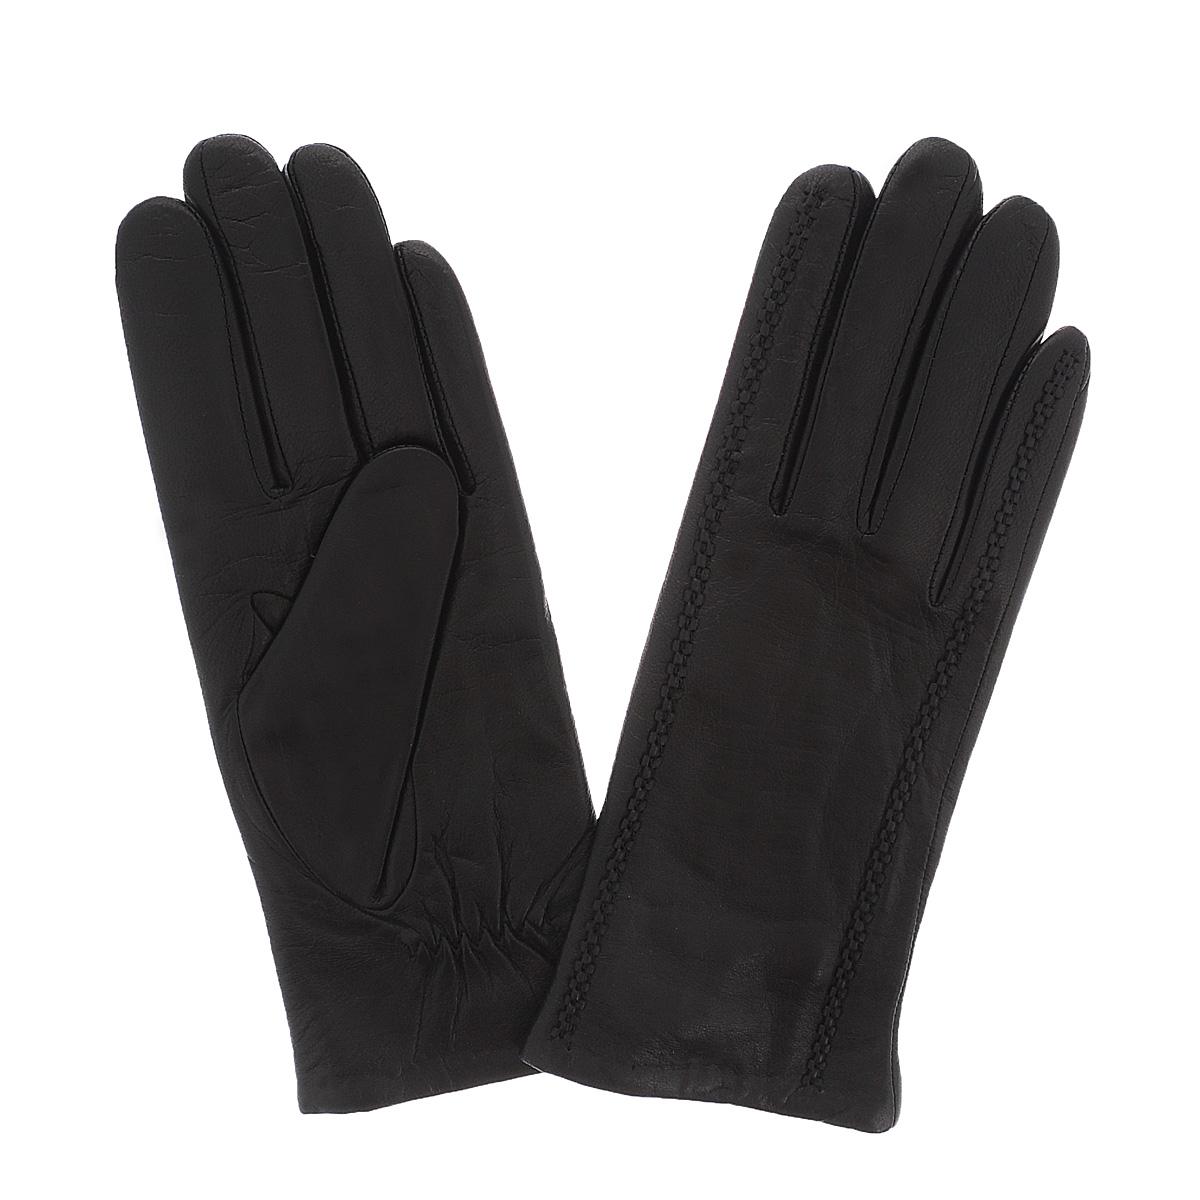 Фото - Перчатки женские Dali Exclusive, цвет: черный. 11_CAMBOLE/NEW. Размер 6,5 женские перчатки imixlot acylic ca02009 mu